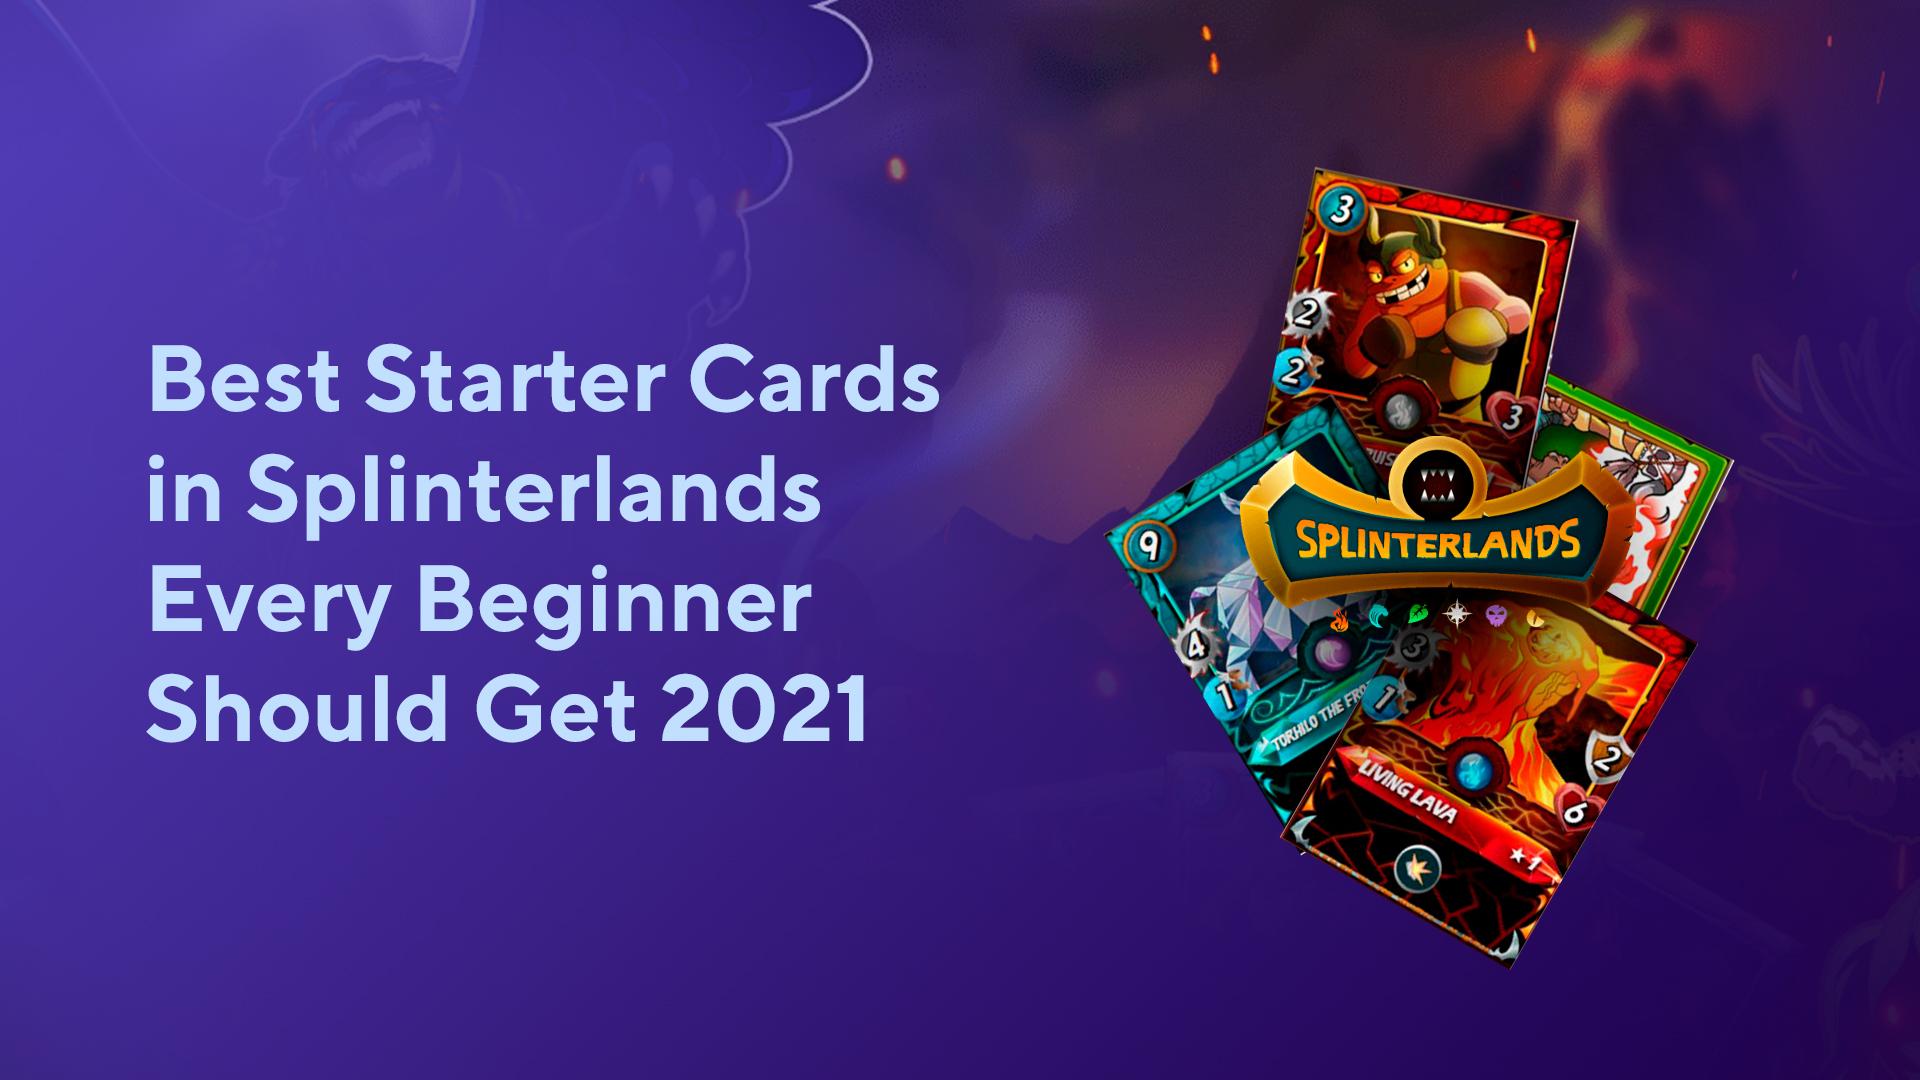 Best Starter Cards in Splinterlands Every Beginner Should Get 2021